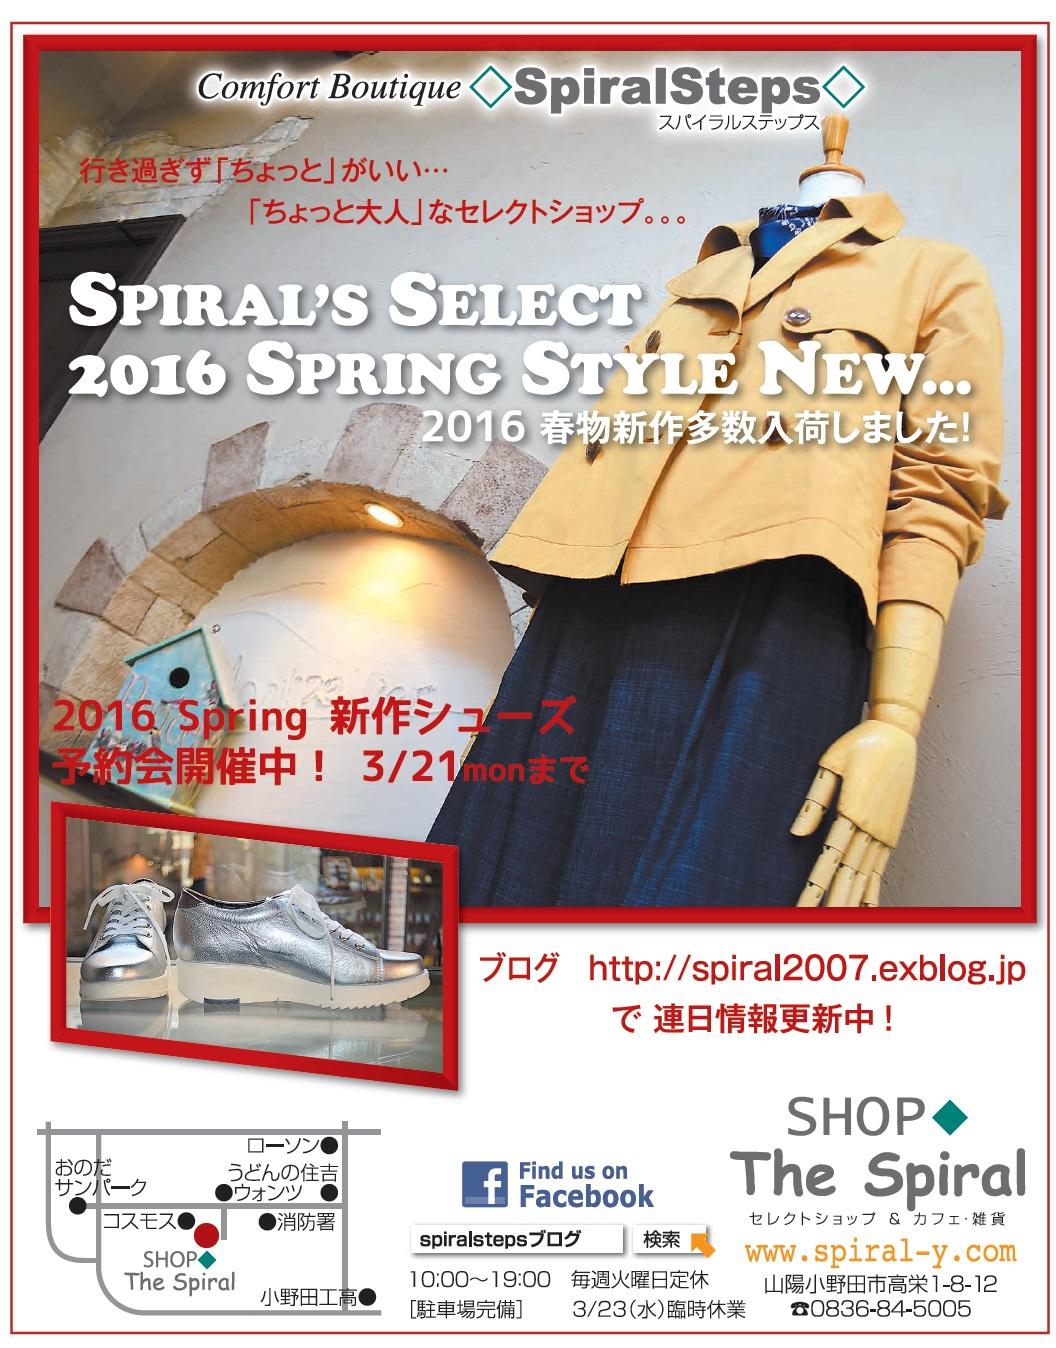 """2016 Spring Style New... 3/11fri\""_d0153941_16134223.jpg"